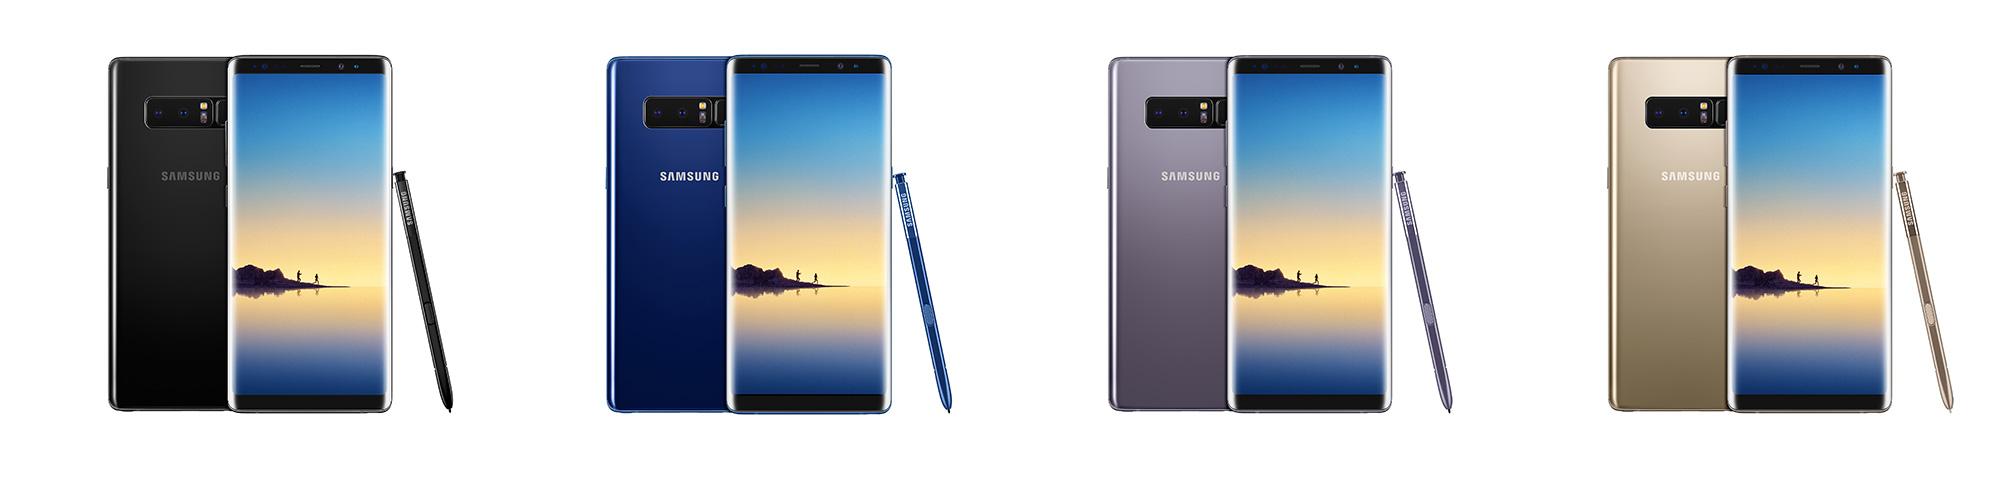 Samsung Galaxy Note8 Colors